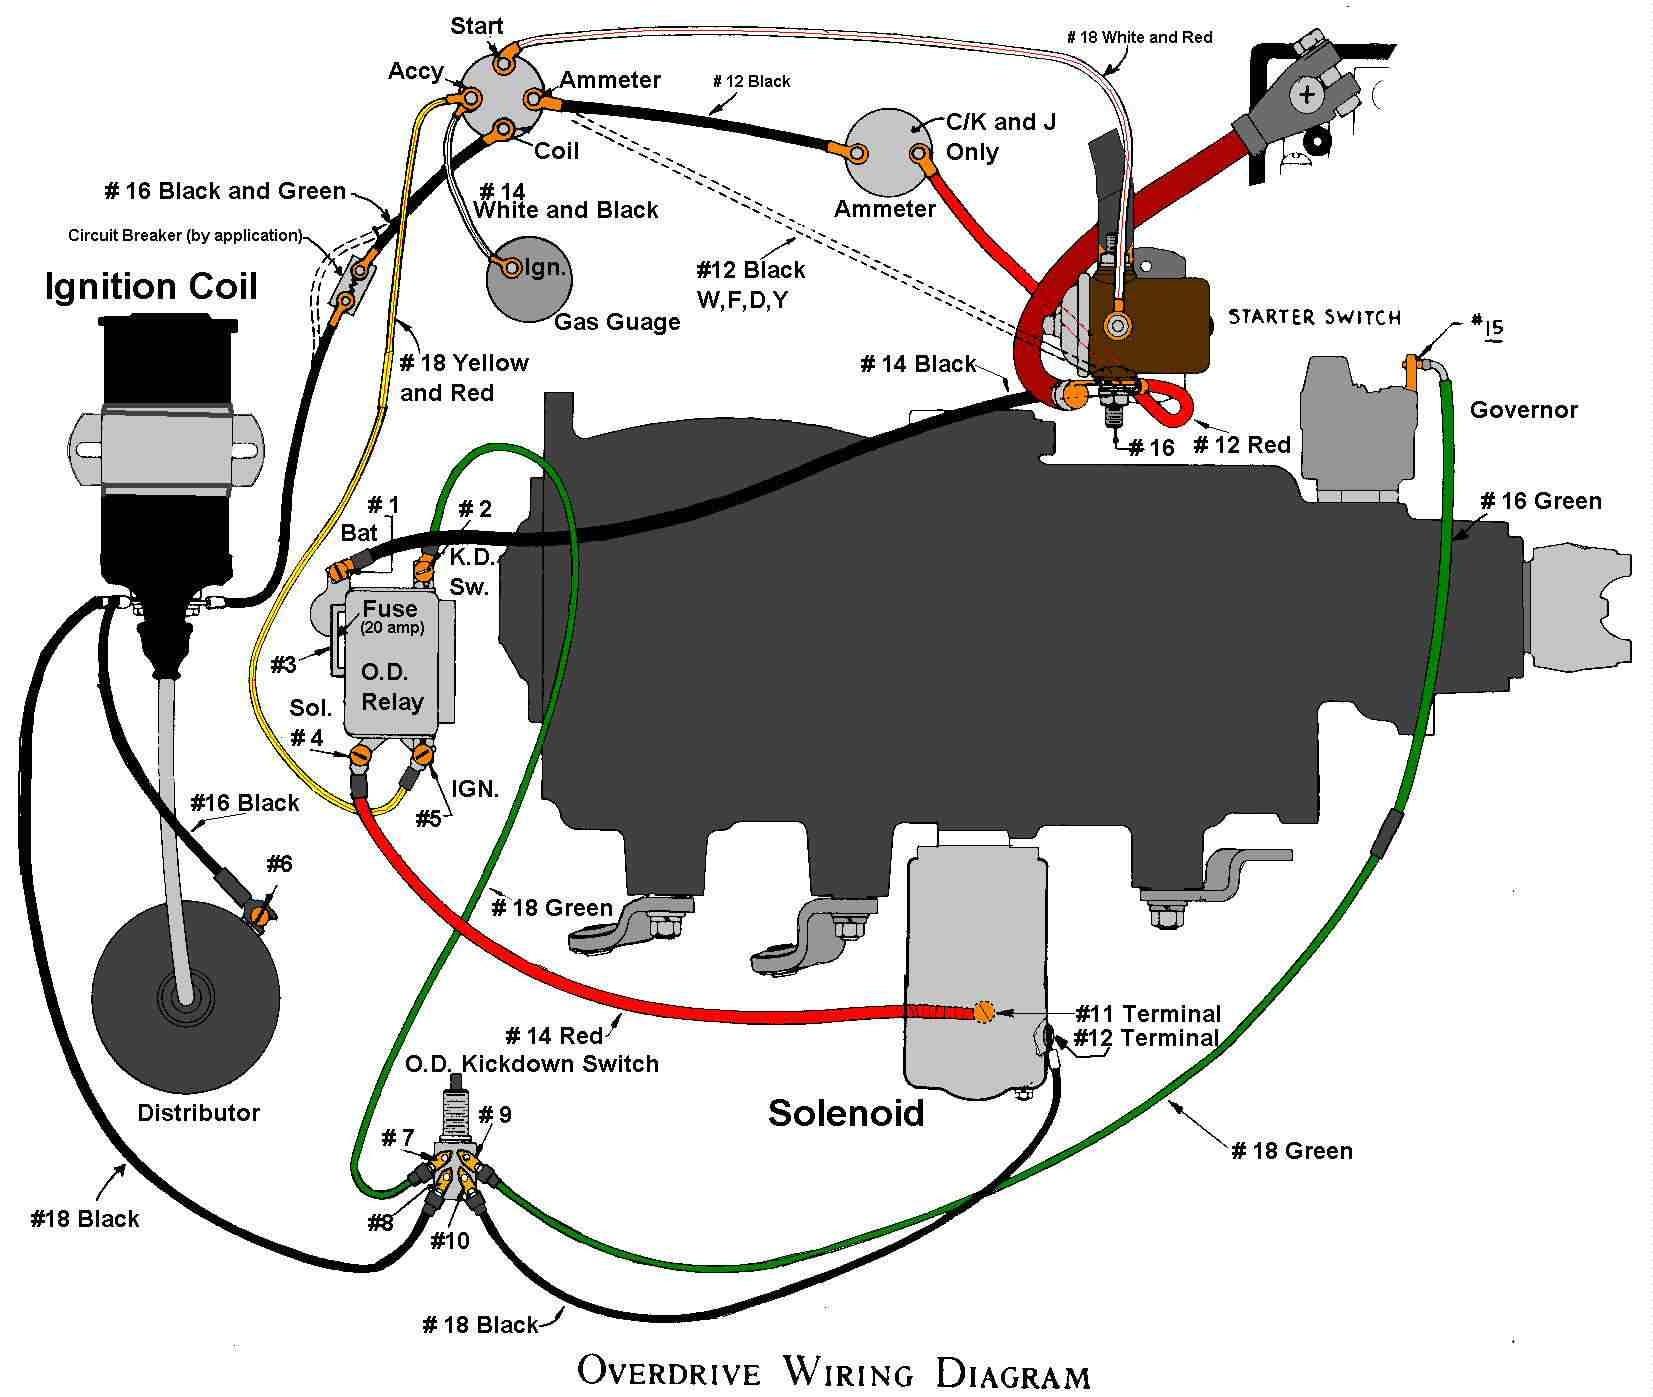 borg warner overdrive wiring diagram awesome wiring. Black Bedroom Furniture Sets. Home Design Ideas